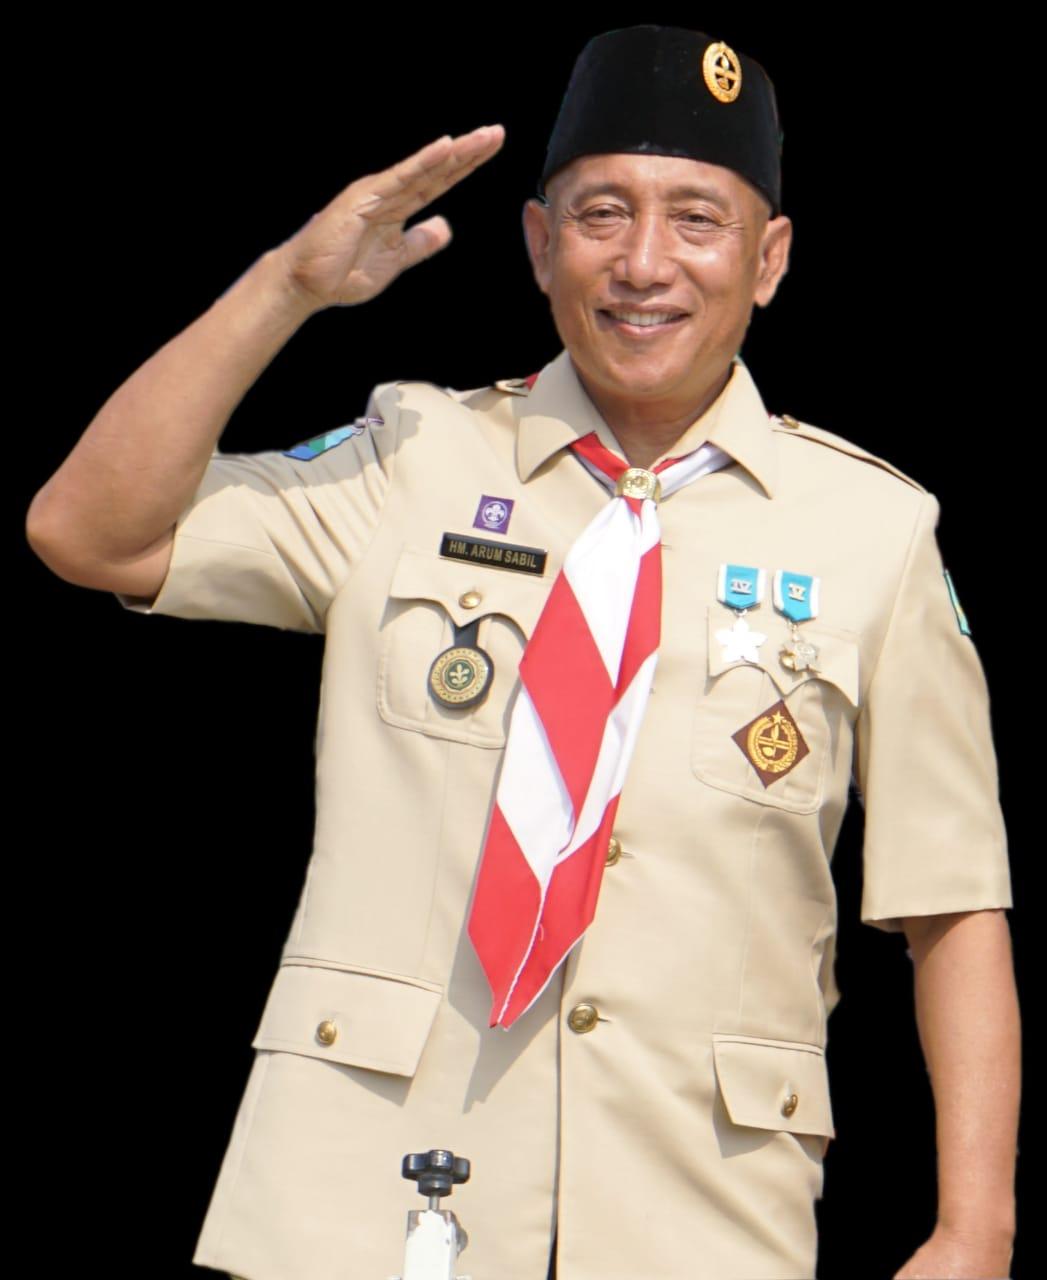 Ketua Kwarda Gerakan Pramuka Jawa Timur, HM Arum Sabil